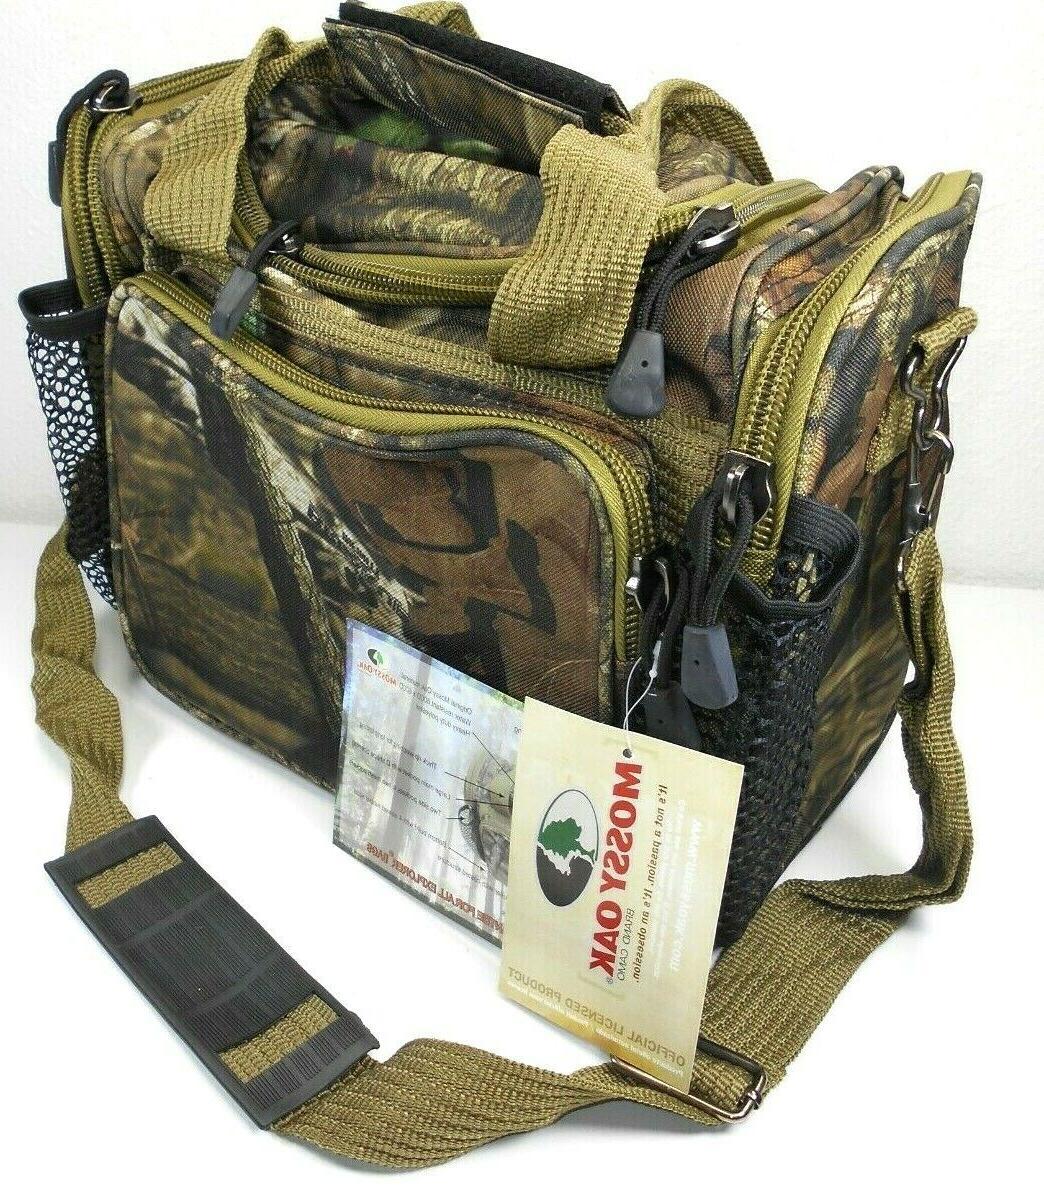 mossy oak duffle bag 13 authentic hunting